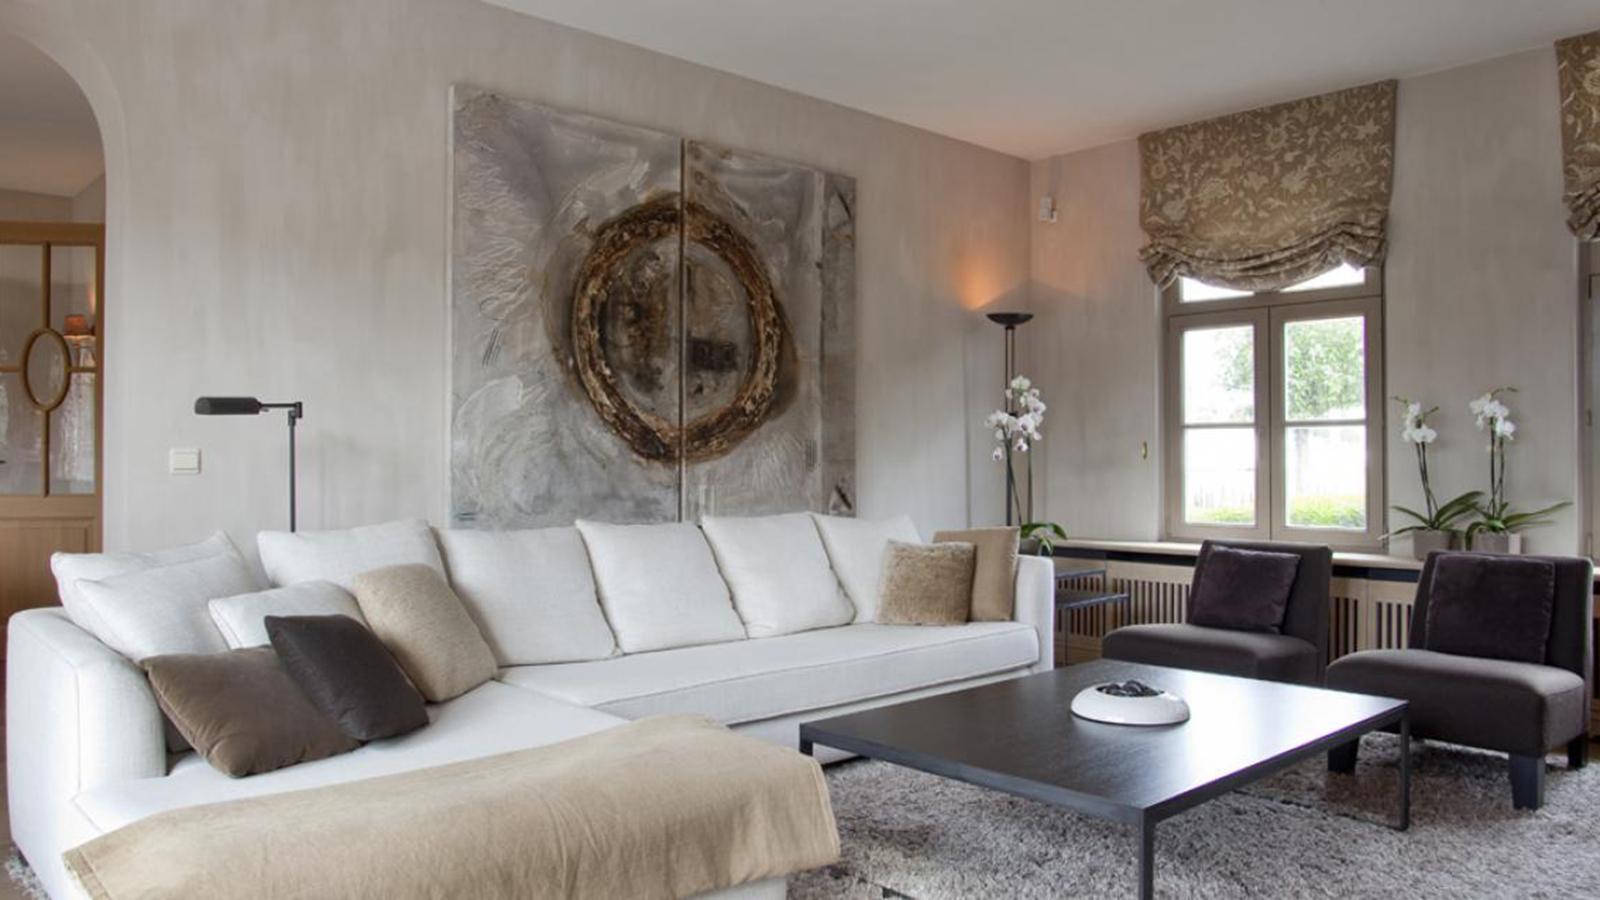 nl.funvit | badkamer plafond kopen, Deco ideeën